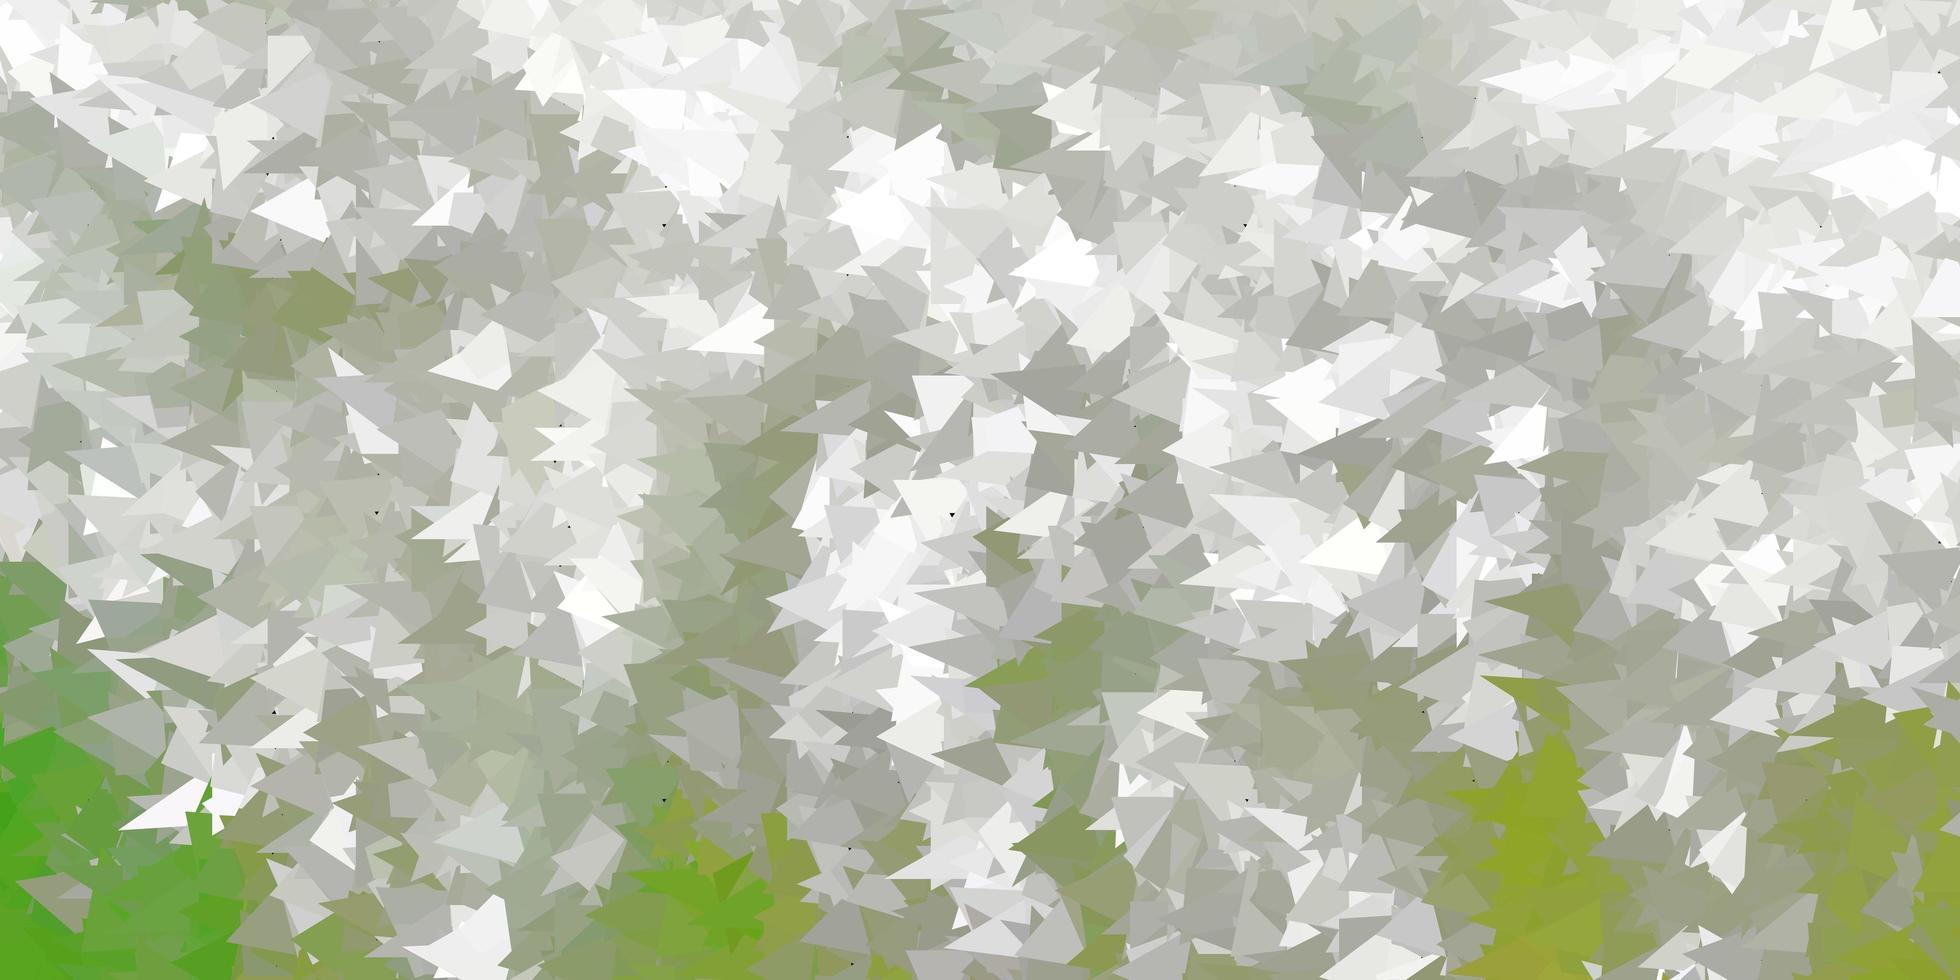 hellgraue Vektor Farbverlauf Polygon Tapete.